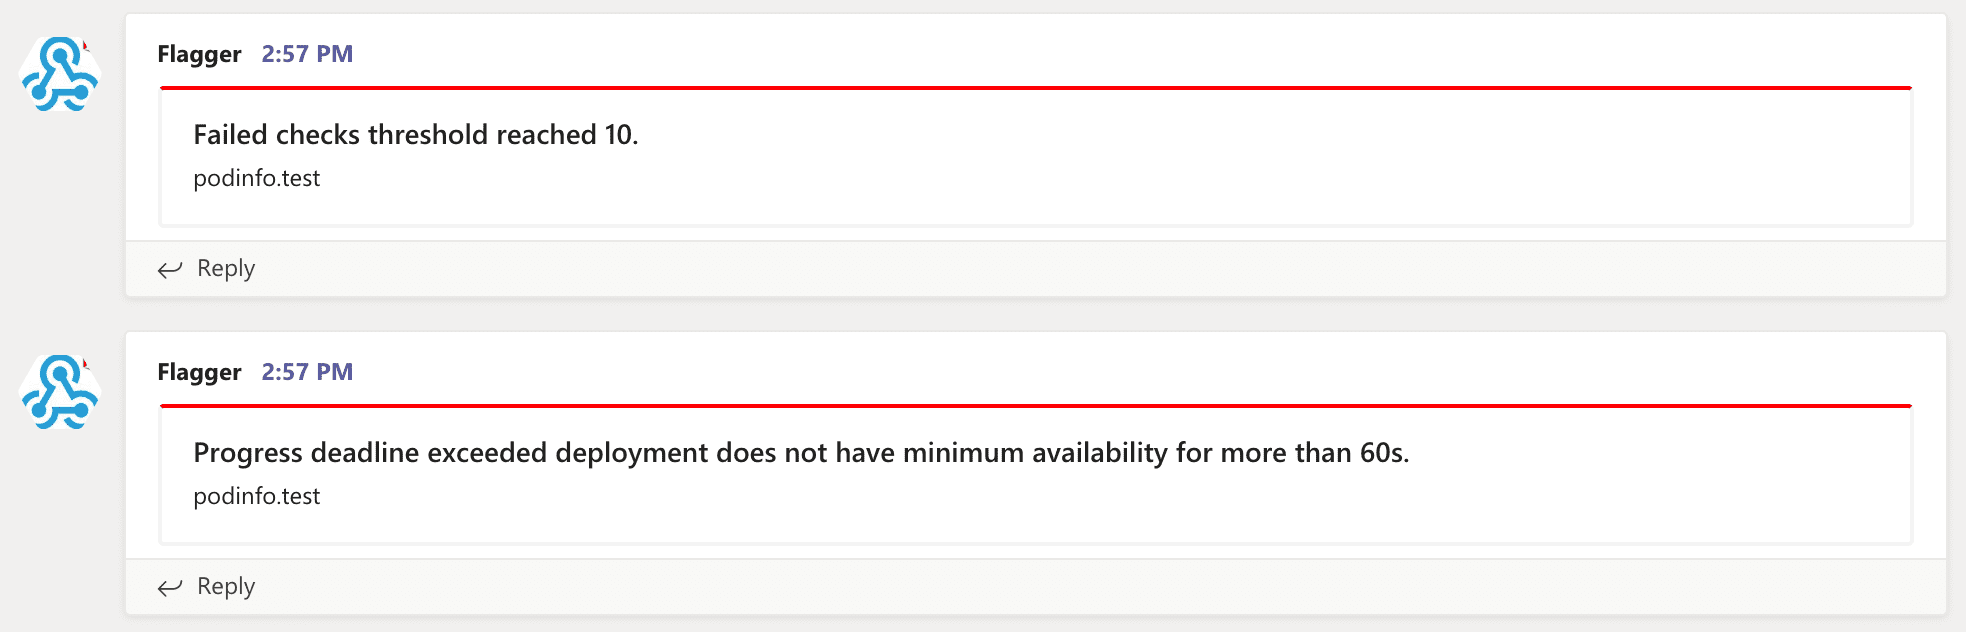 MS Teams Notifications